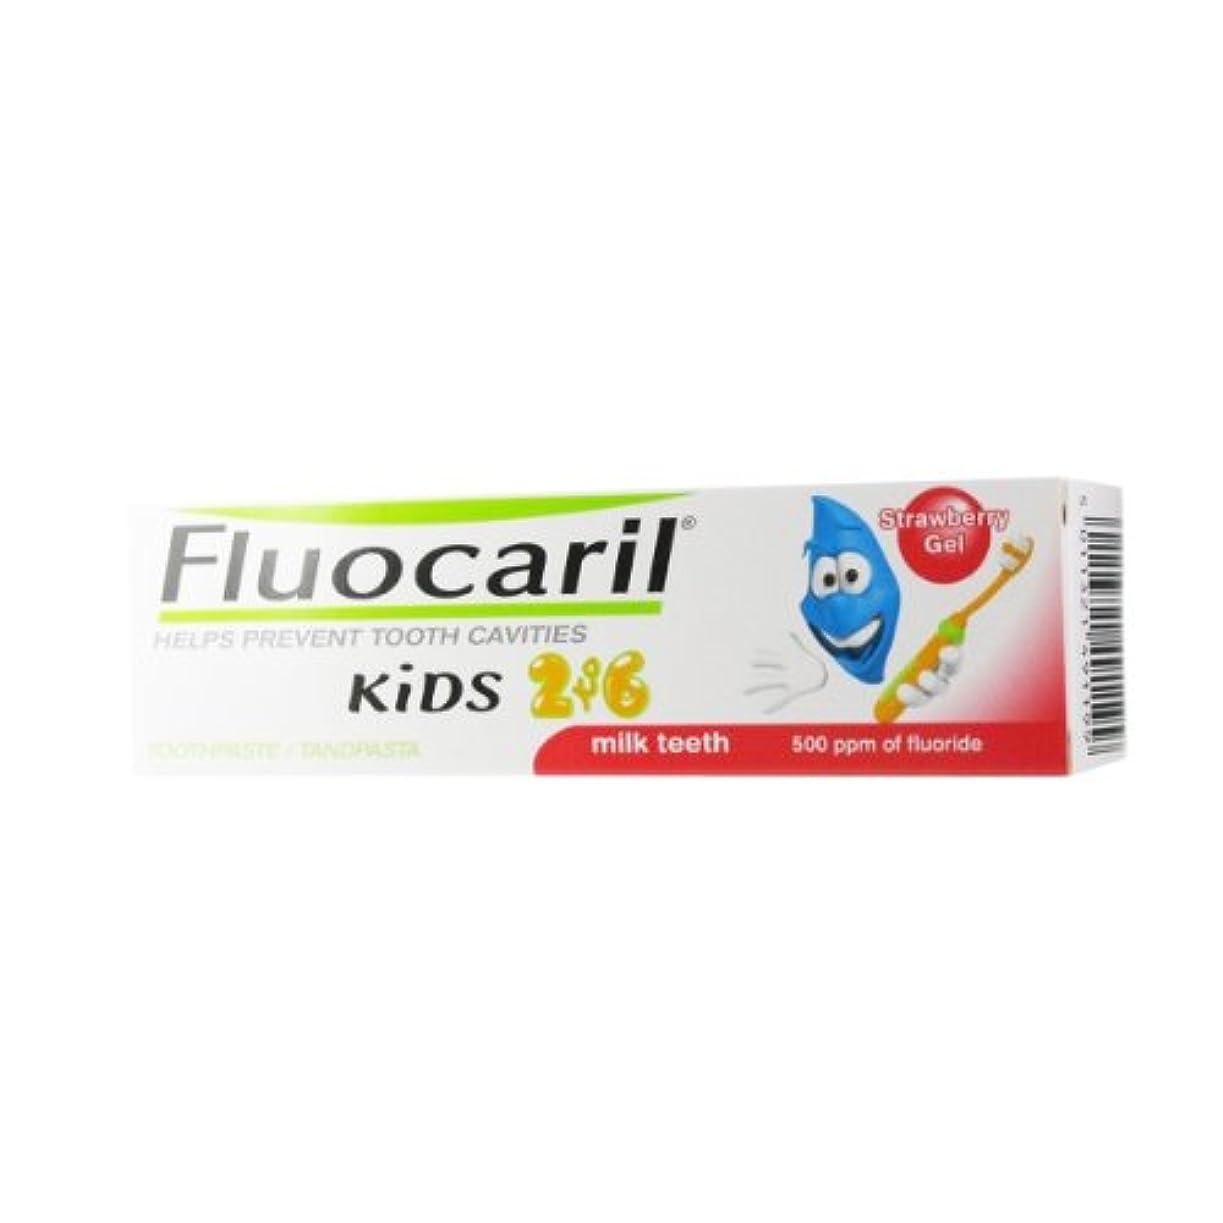 薬局心配箱Fluocaril Kids 2 To 6 Strawberry Gel 50ml [並行輸入品]